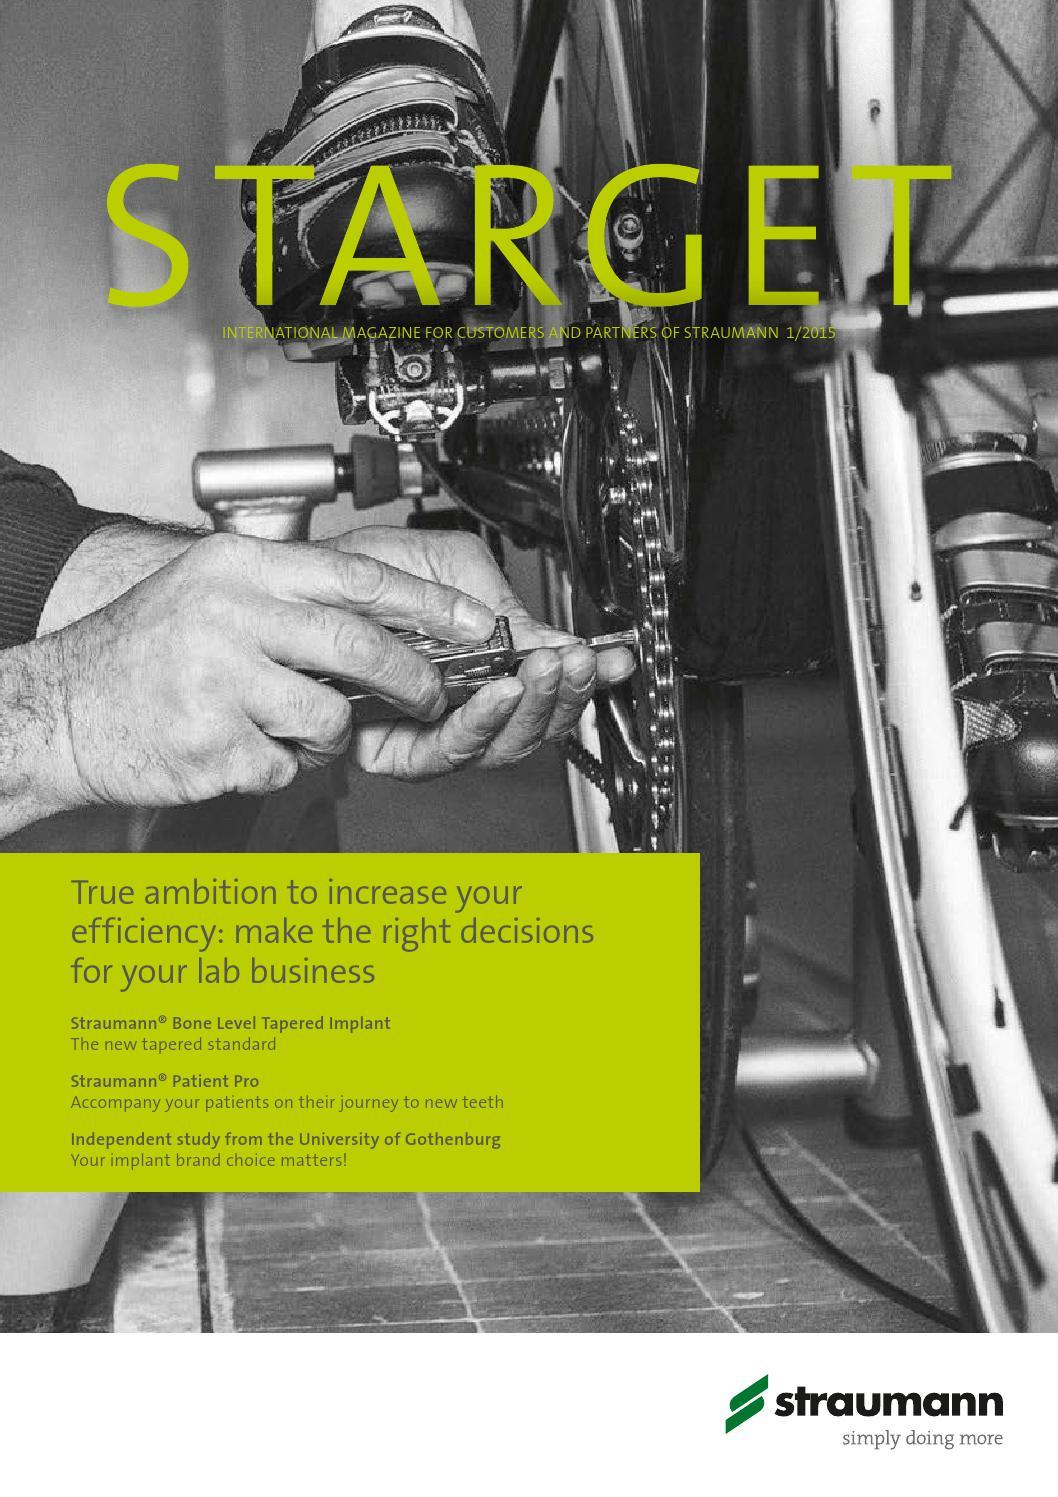 Starget 01 2015 (English) by Institut Straumann AG - issuu